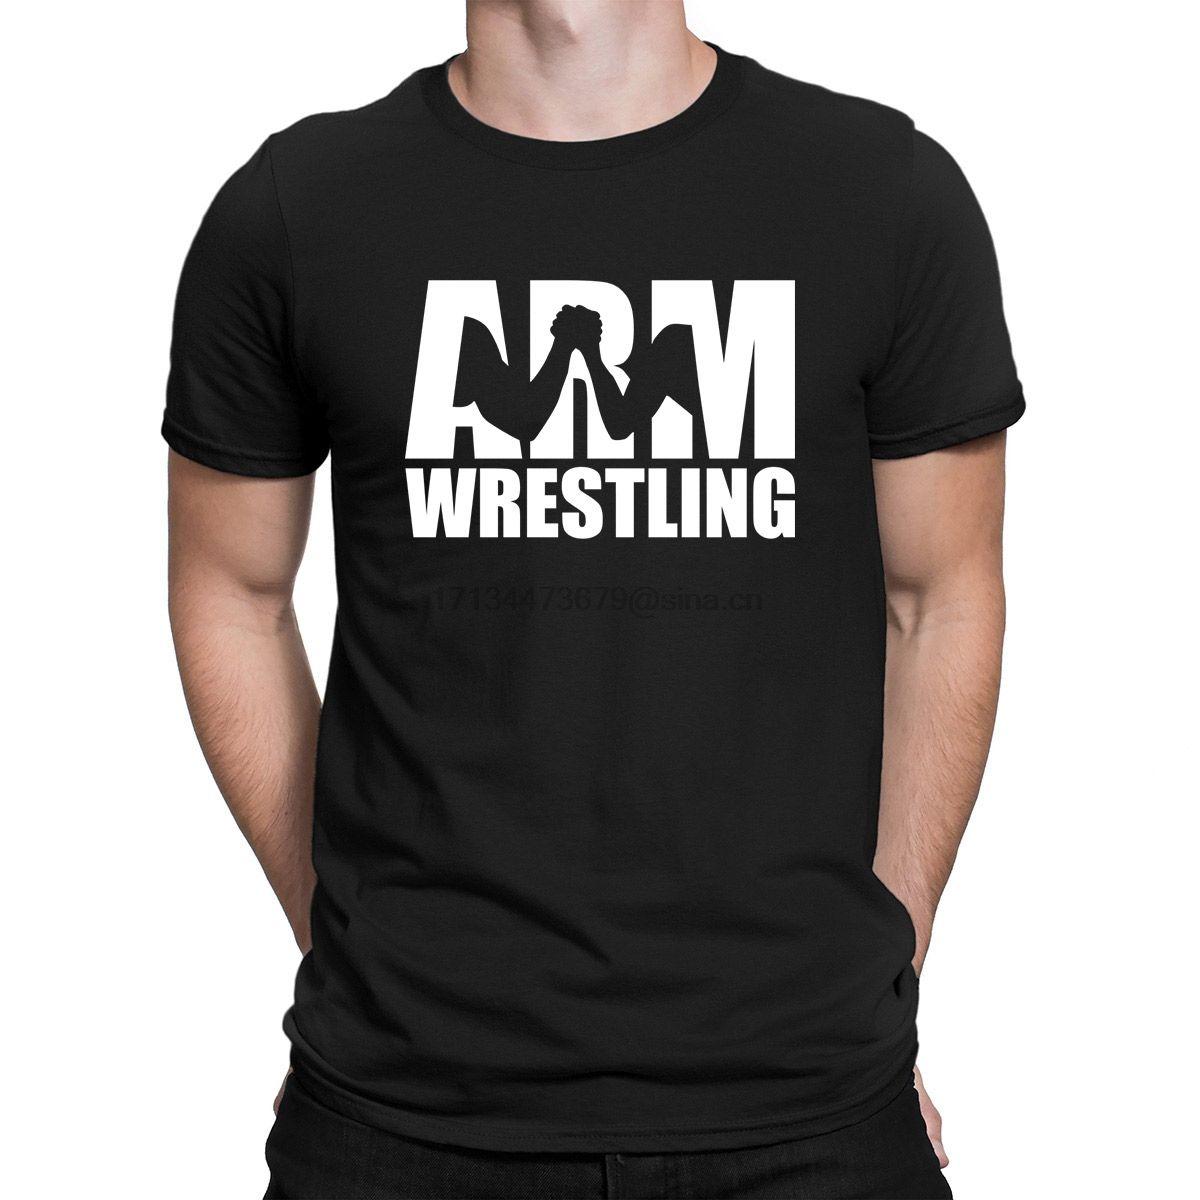 Рука Wrestlings Tshirt Лето Стиль Фитнес Классический евро Размер S-3XL Тенниска для мужчин Дизайн Top Tee Тонкий изворотливый